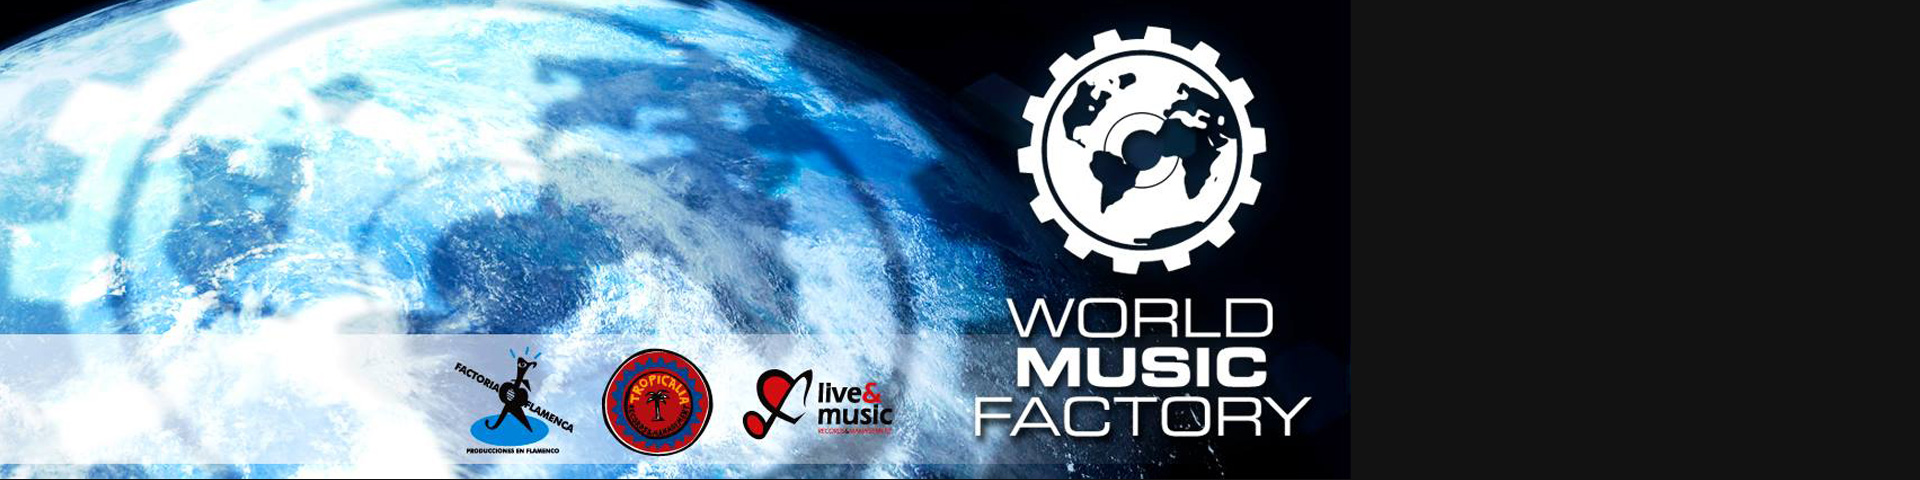 World Music Factory